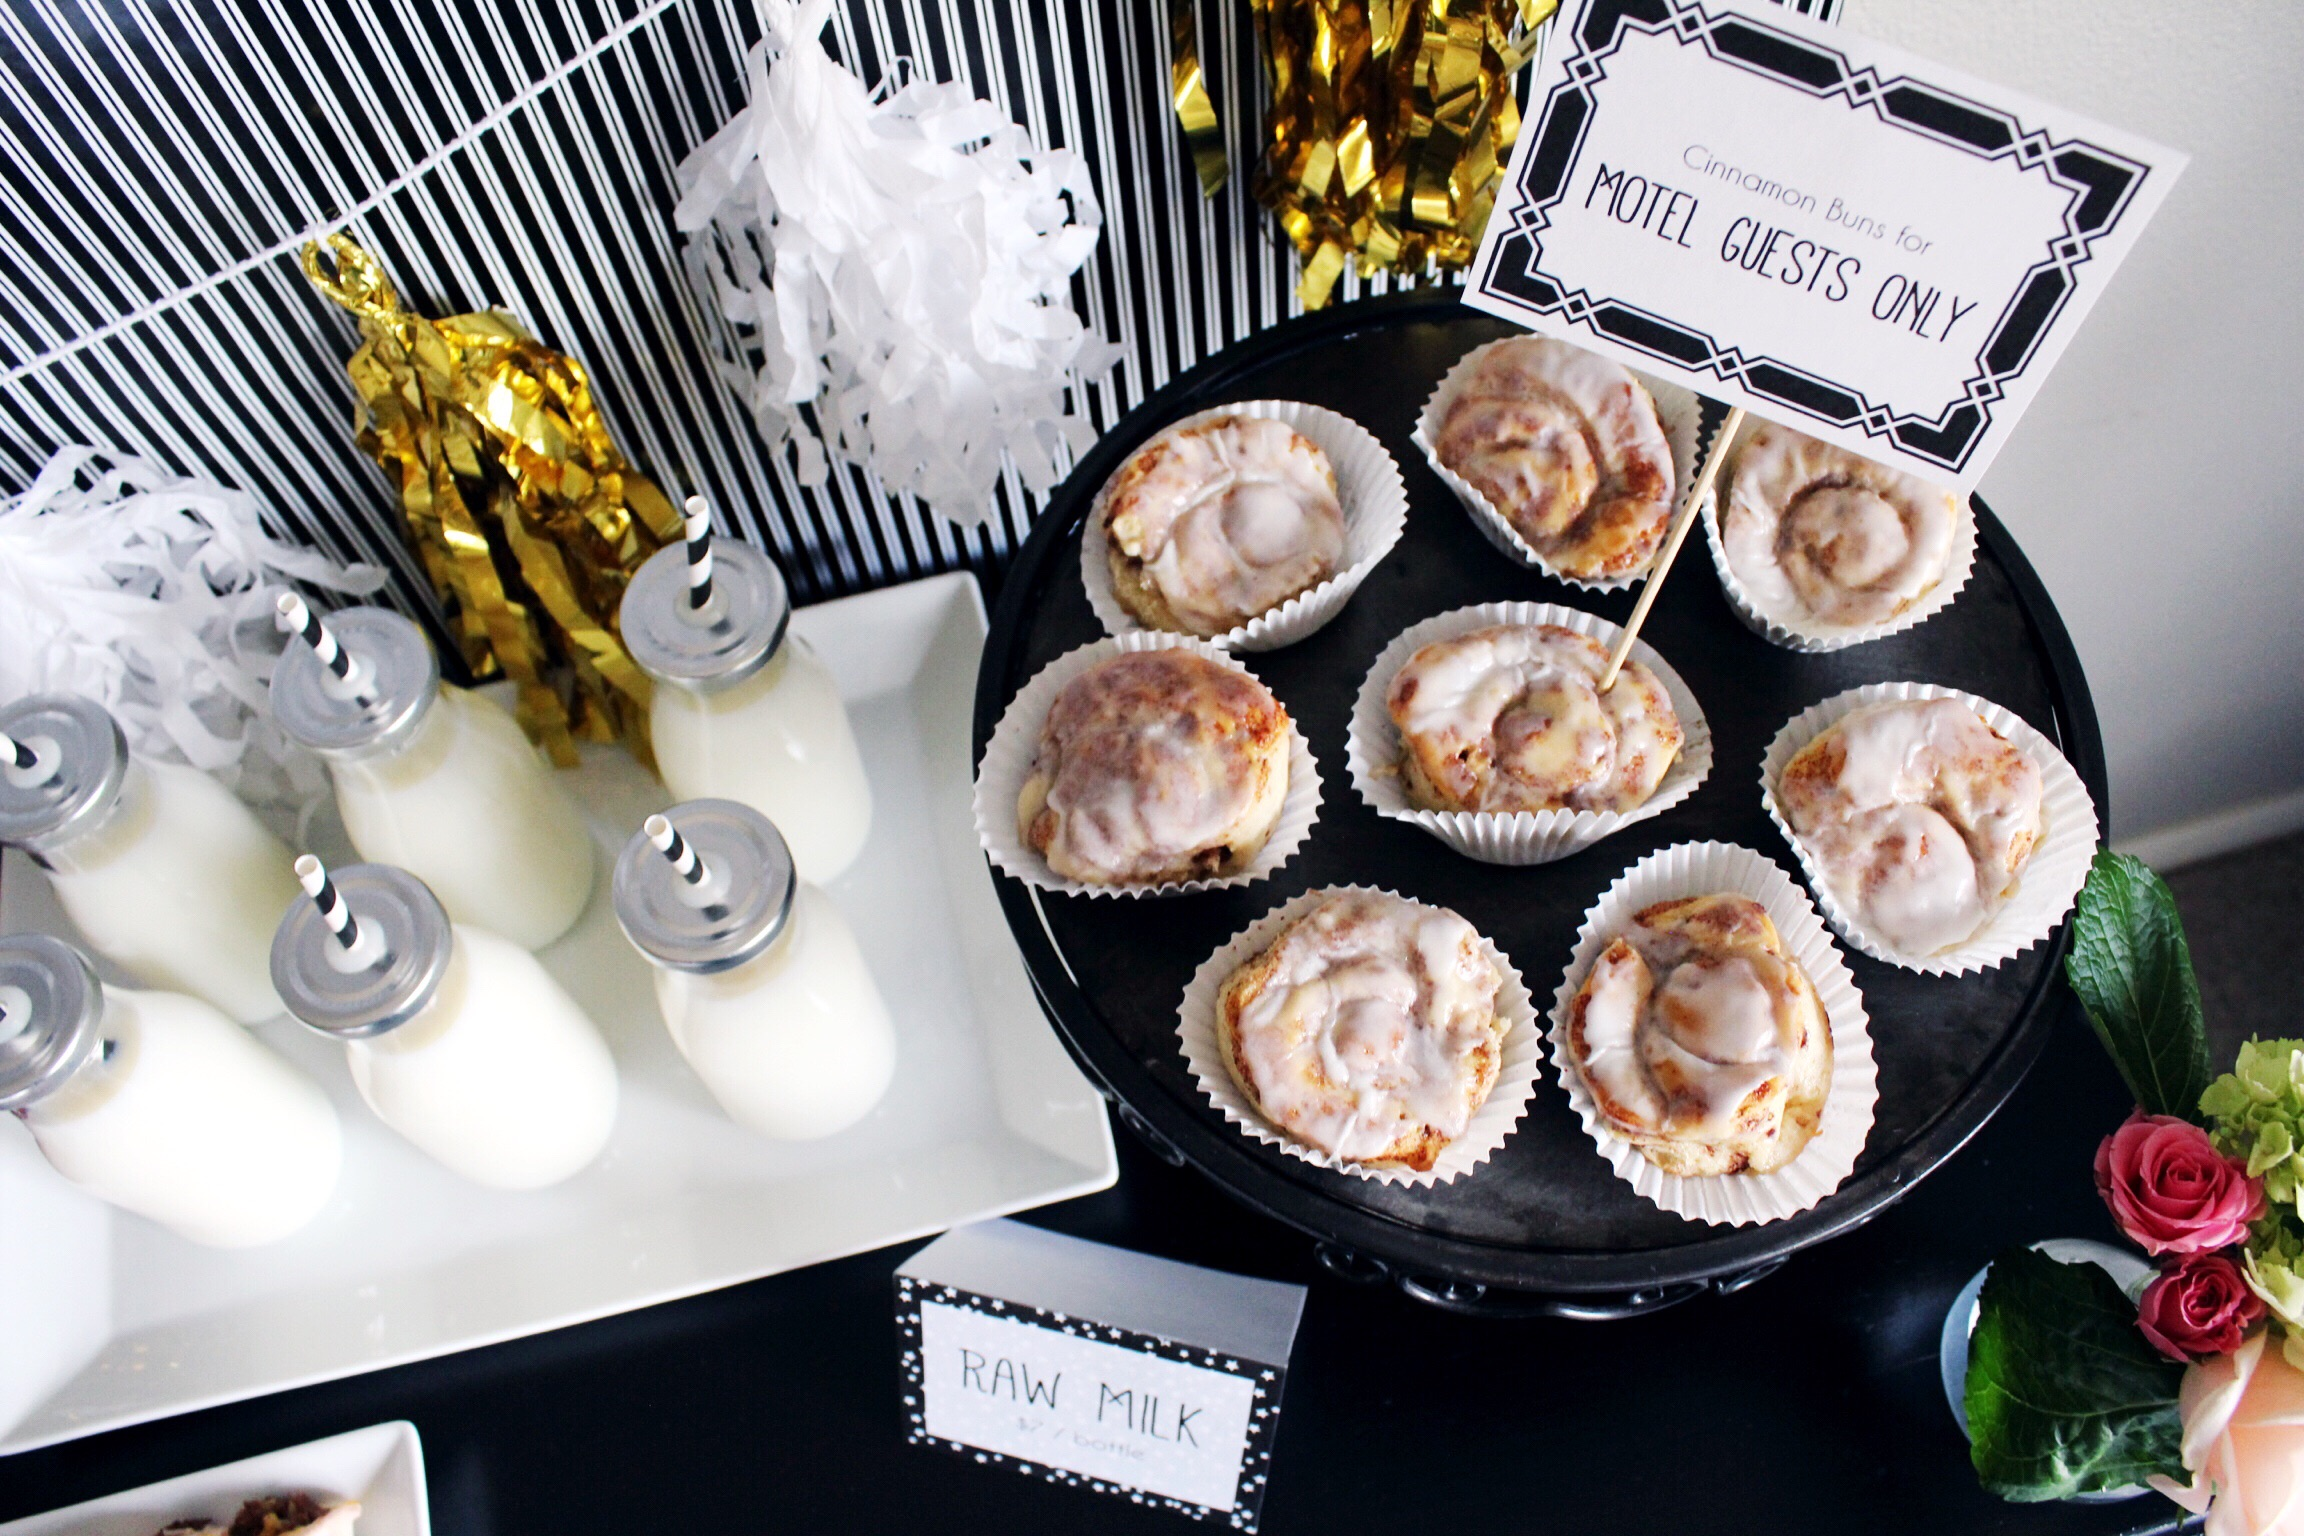 Schitt's Creek_Party Ideas_Food_Cinnamon Buns Rolls_Raw Milk_Design Organize Party.jpg